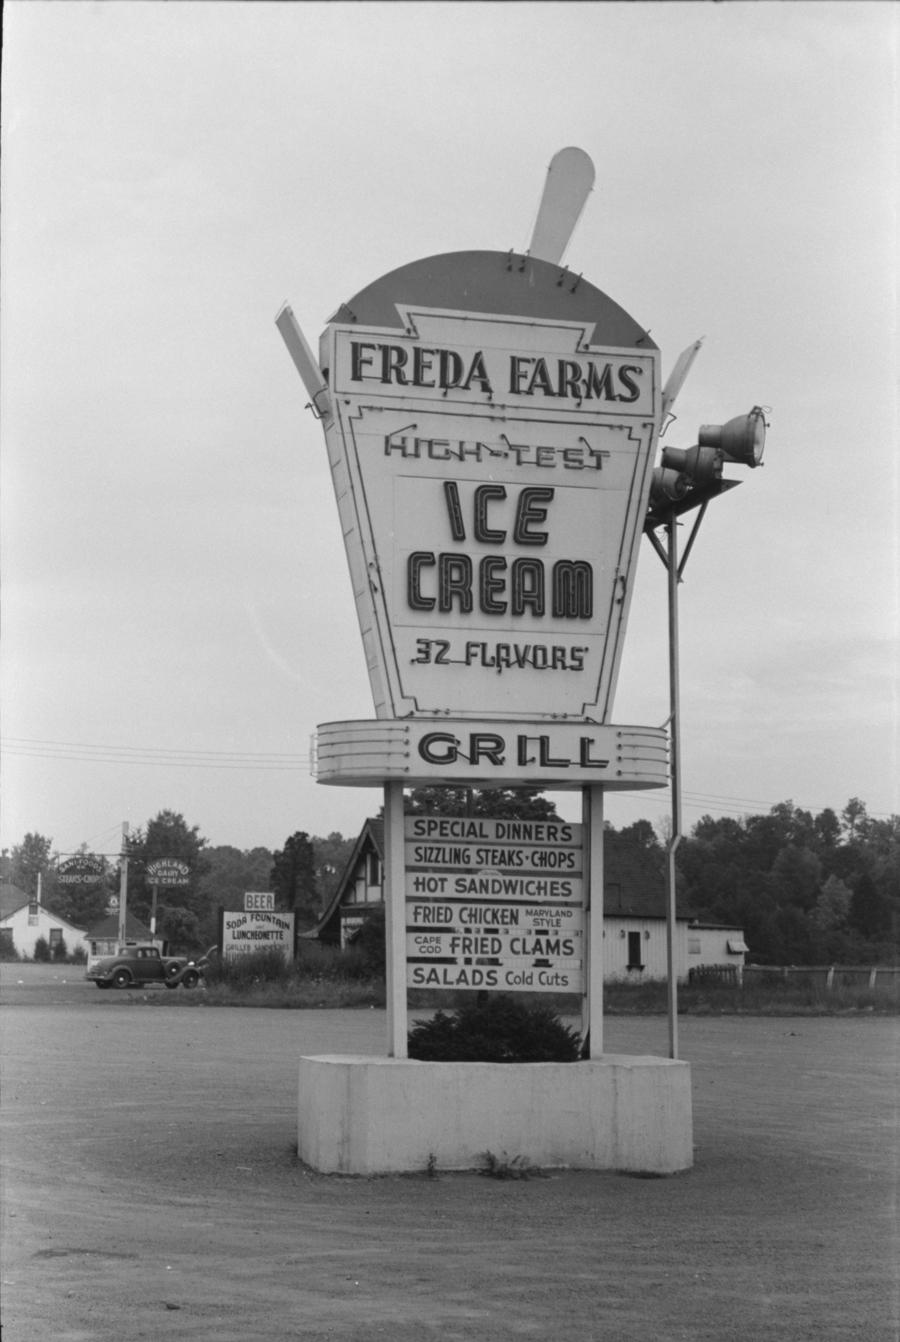 Ice cream advertising near Berlin, Connecticut